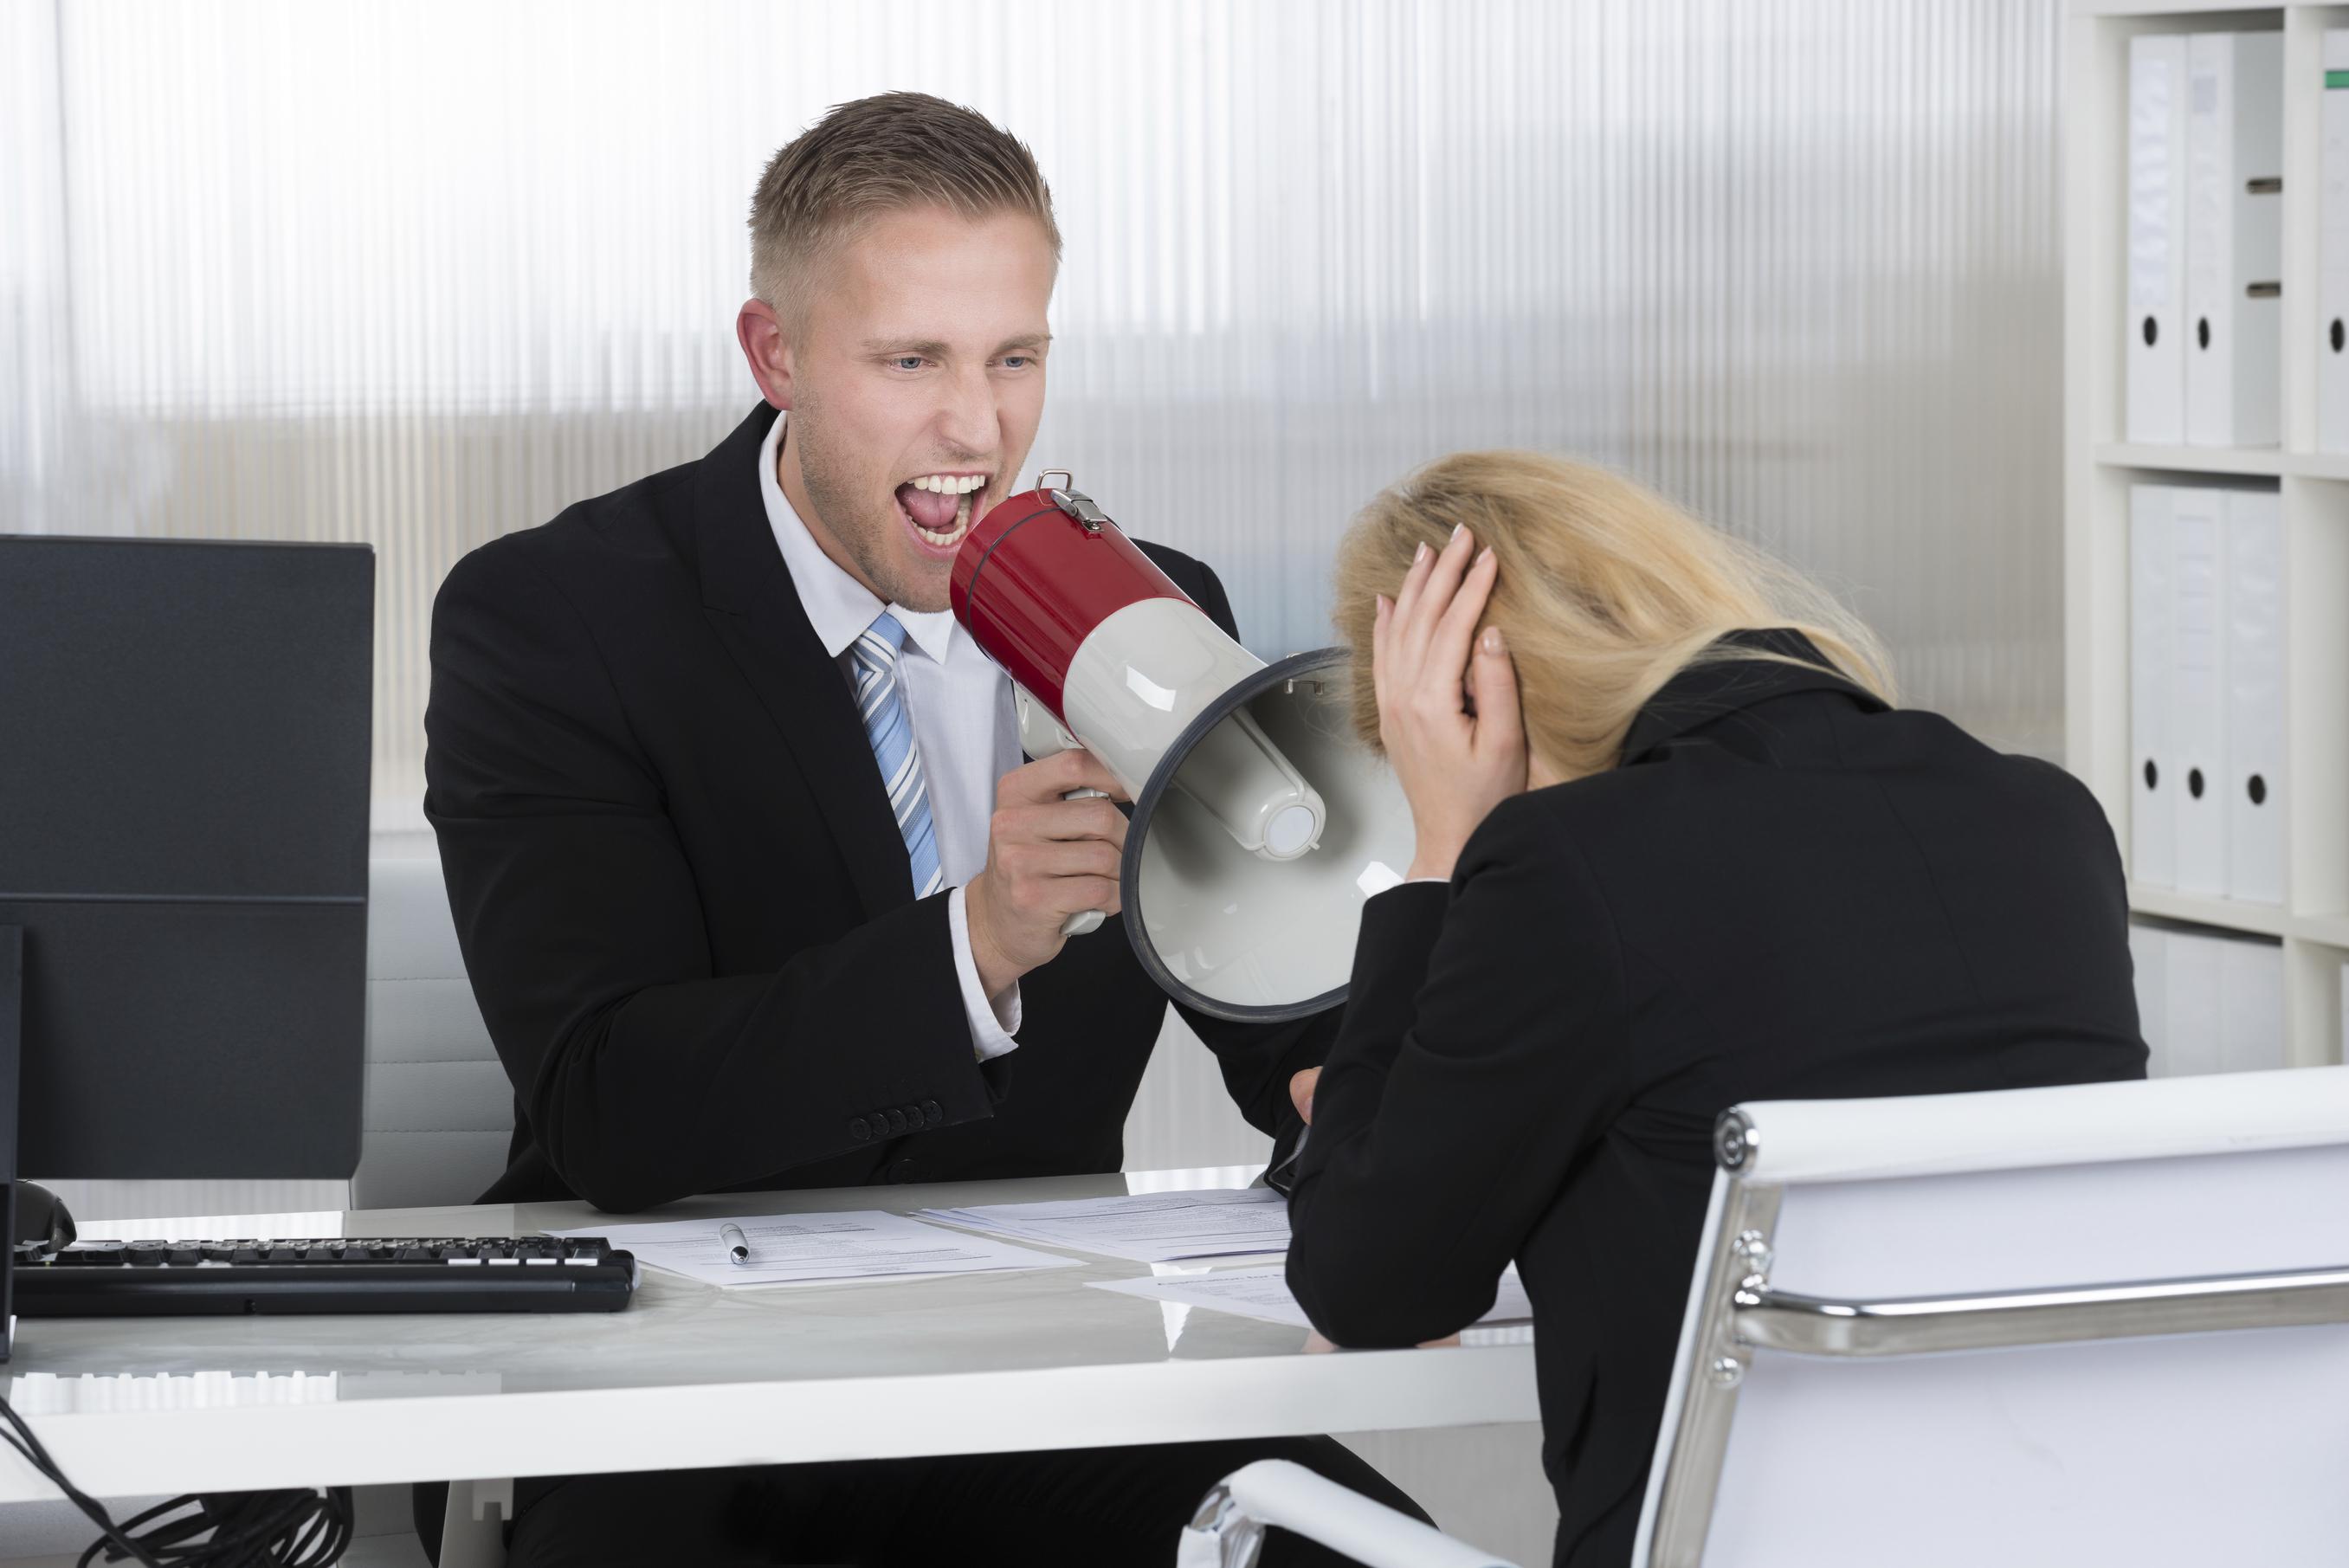 Boss Shouting At Businesswoman Through Loudspeaker In Office